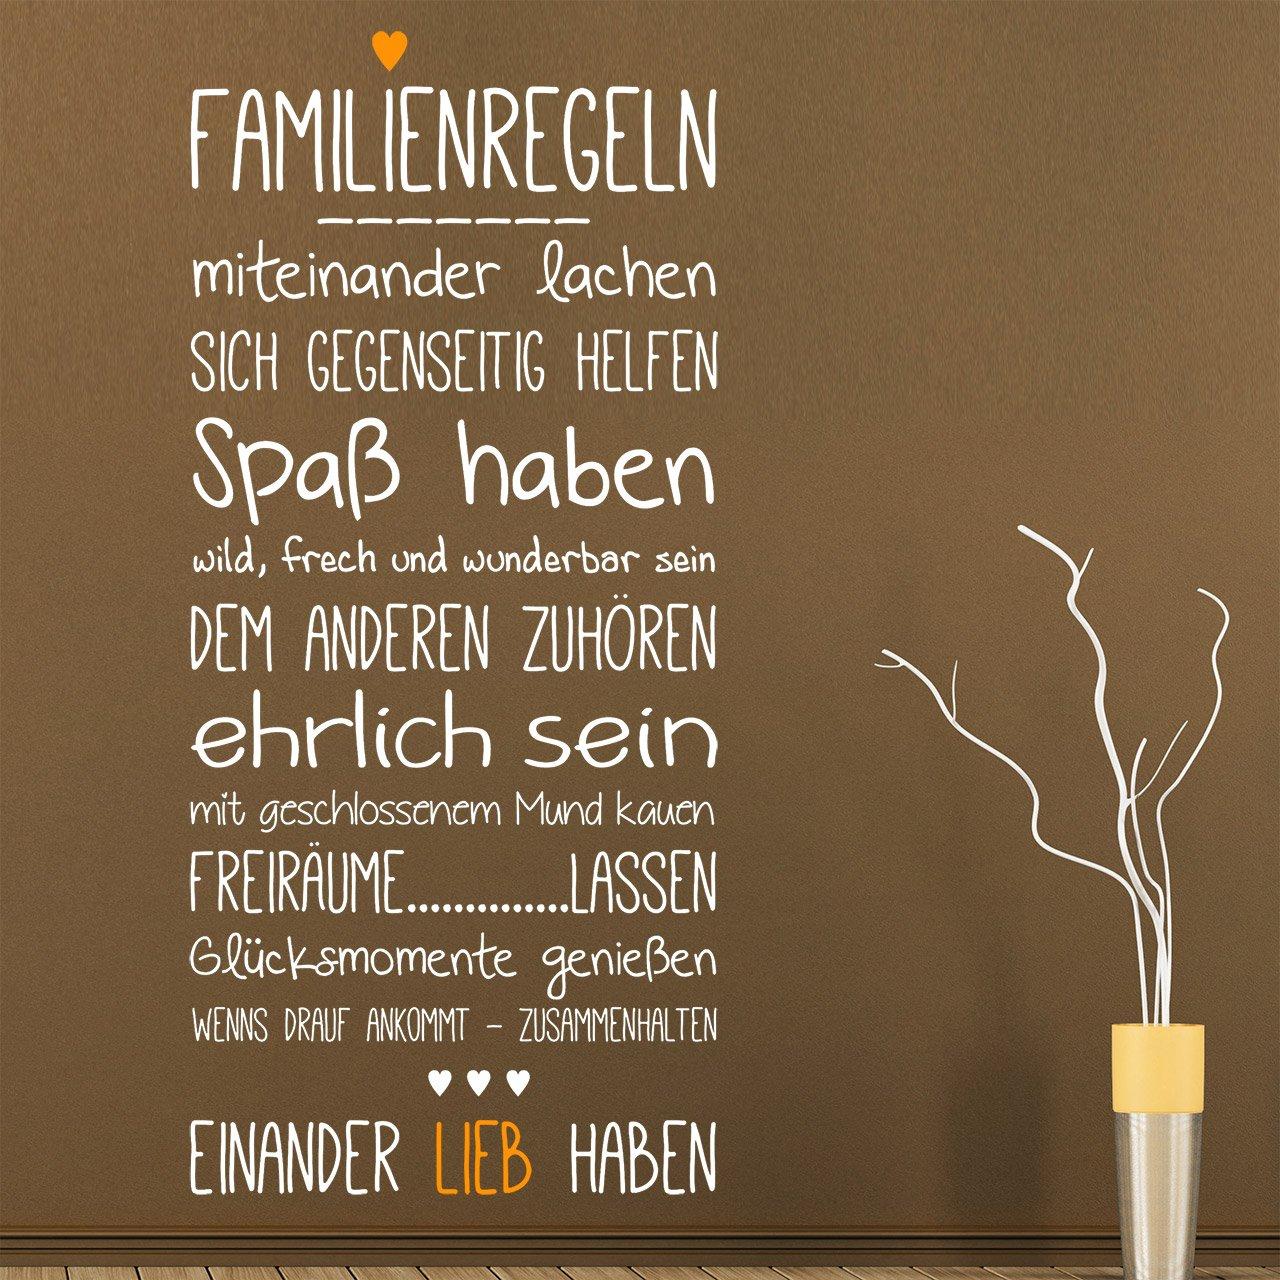 DESIGNSCAPE® Wandtattoo Familienregeln mit Herz 64 x 140 cm (B (B (B x H) Farbe 1  weiss DW801511-M-F5 B01EHMNDWS Wandtattoos & Wandbilder b280d4